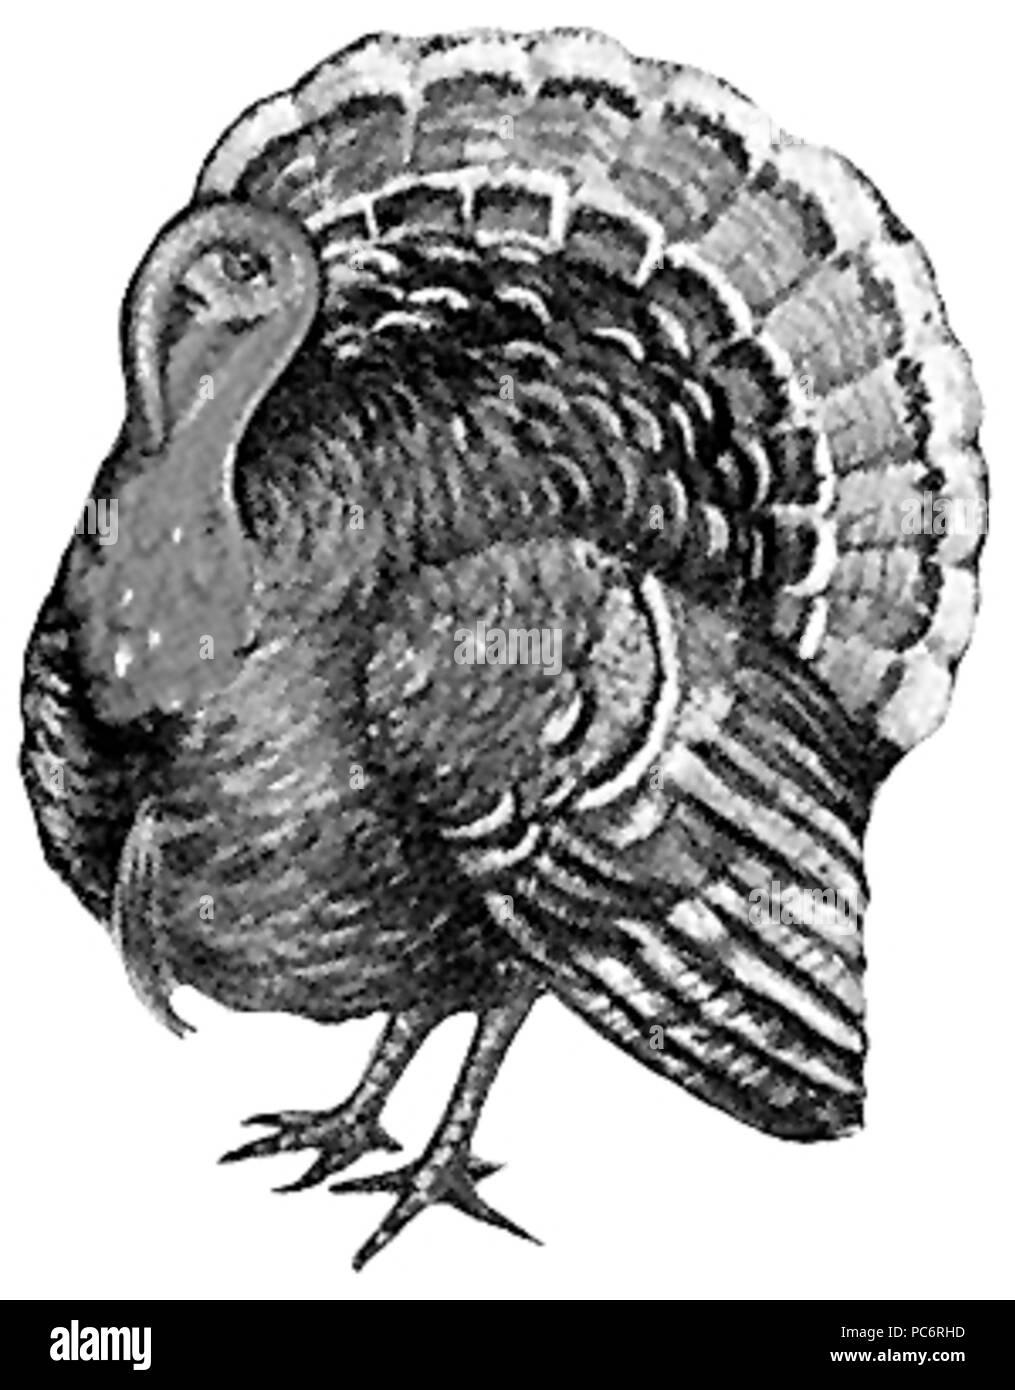 617 Turkey (bird) - B&W drawing Stock Photo